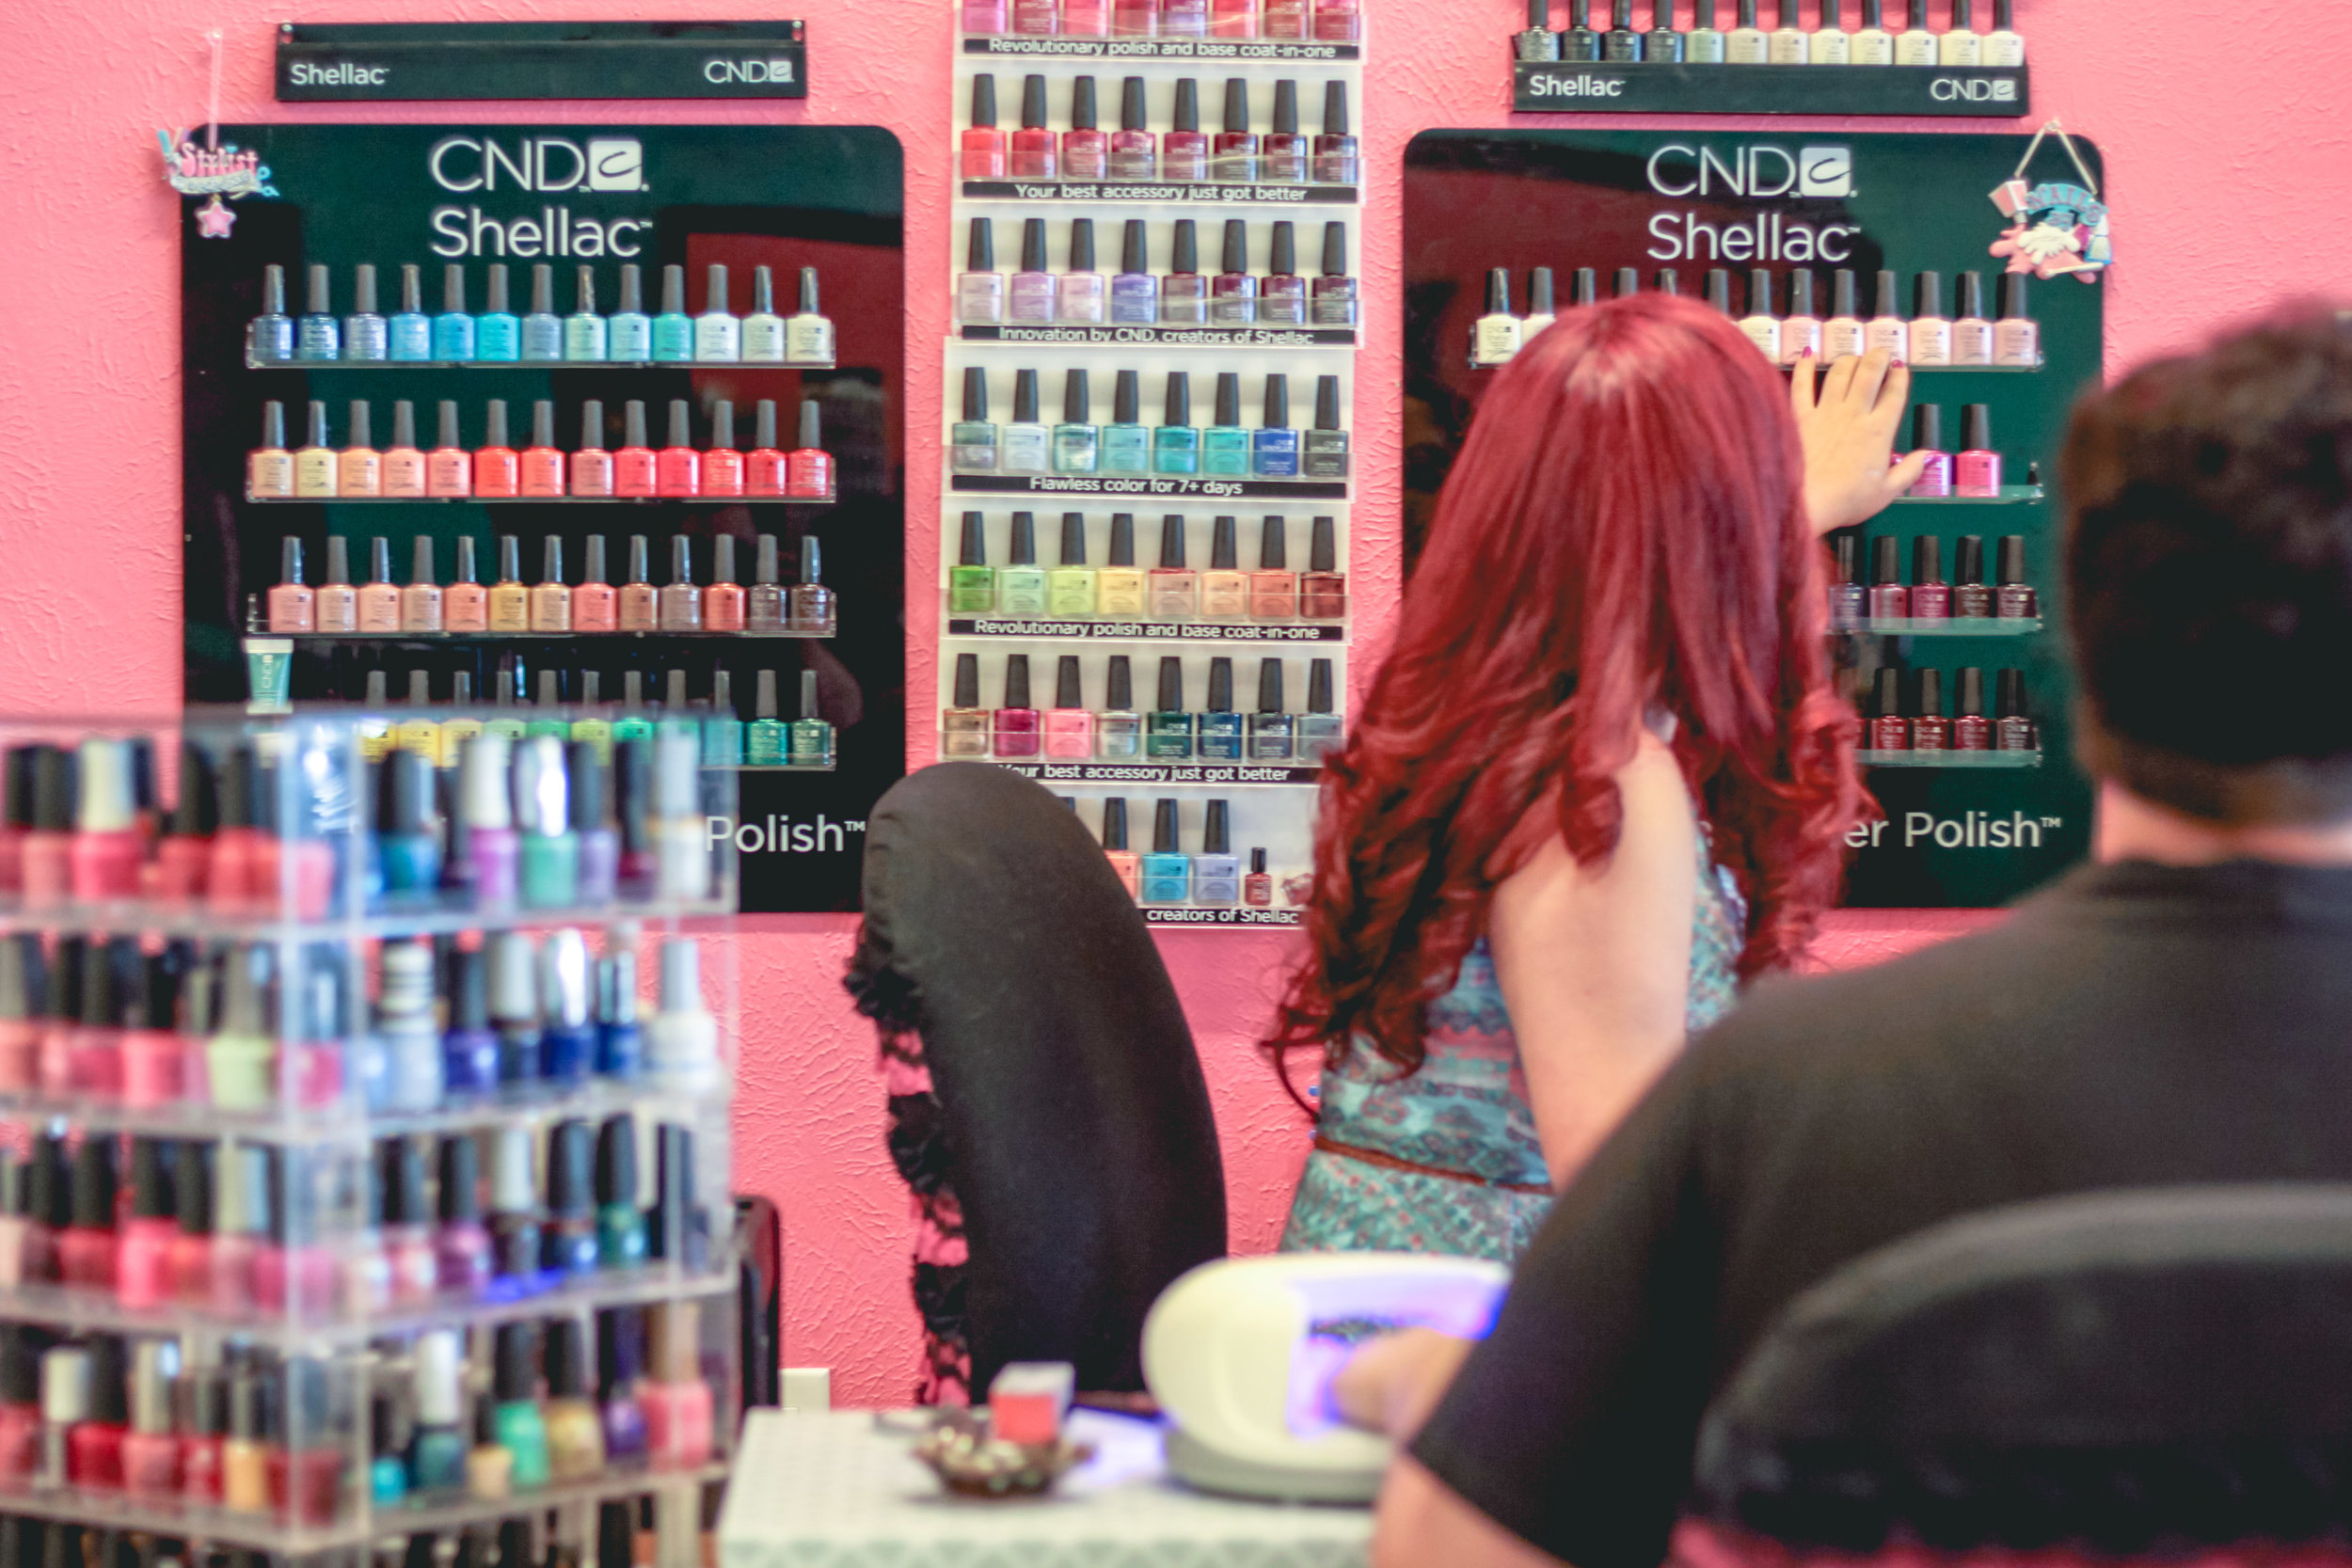 Oooh Girl Who Did Your Hair Salon & Spa  - Albuquerque, NM